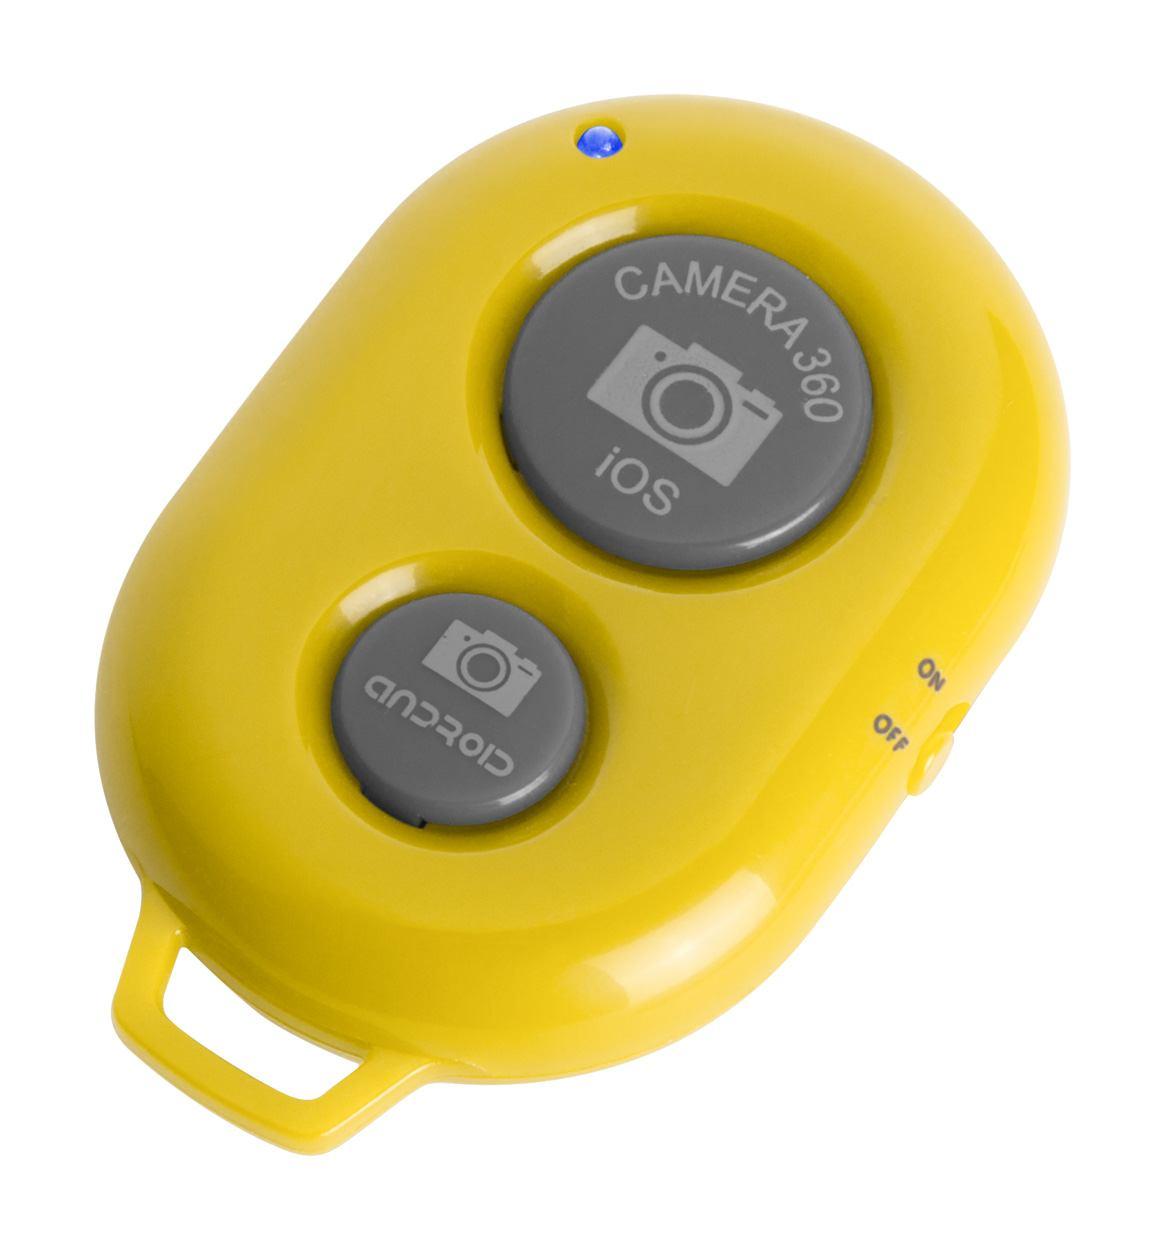 Dankof samospoušť pro fotoaparát